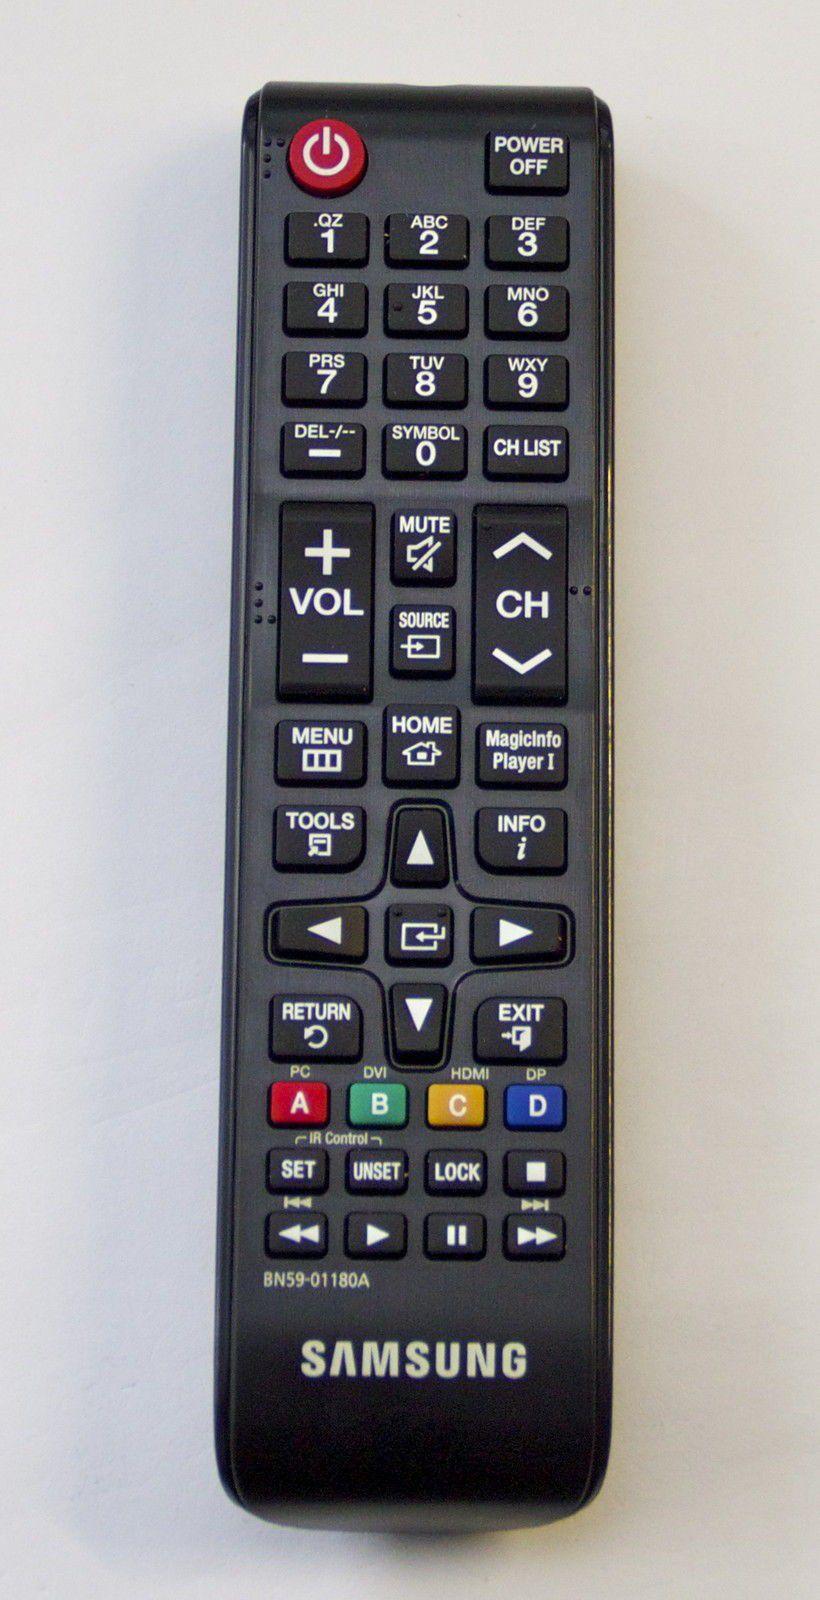 Samsung Remote Control TM1240A pults